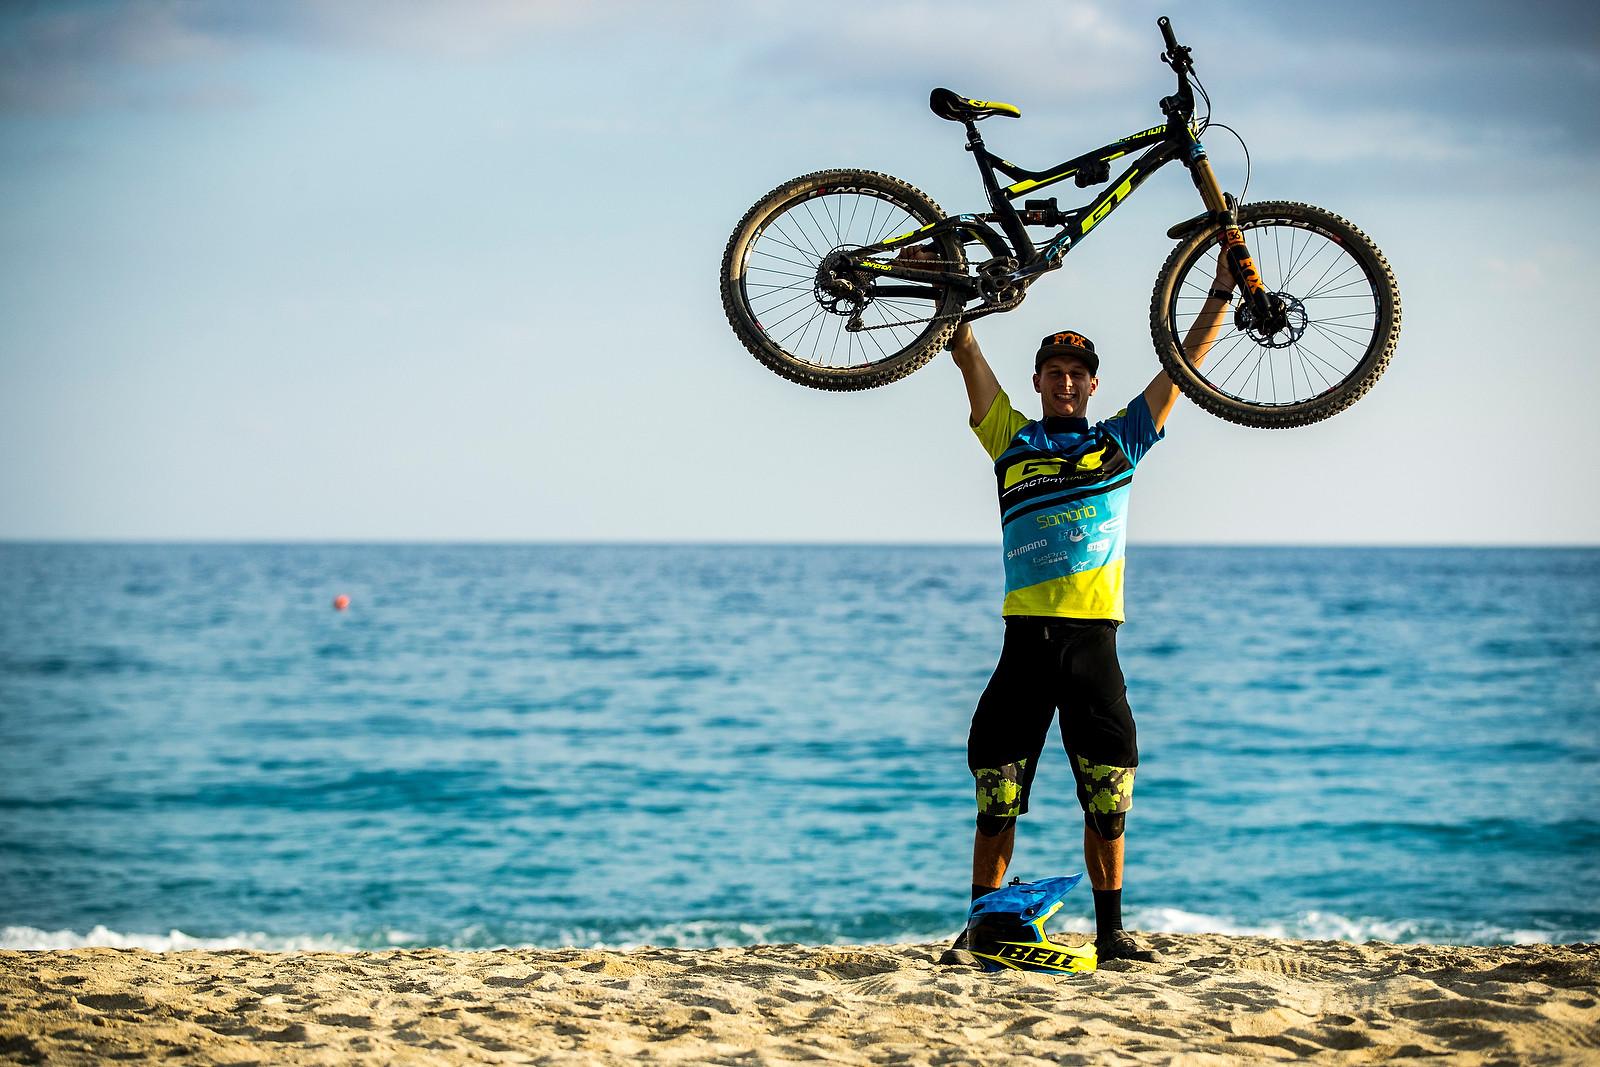 WINNING BIKE: Martin Maes' GT Sanction - WINNING BIKE: Martin Maes' GT Sanction - Mountain Biking Pictures - Vital MTB